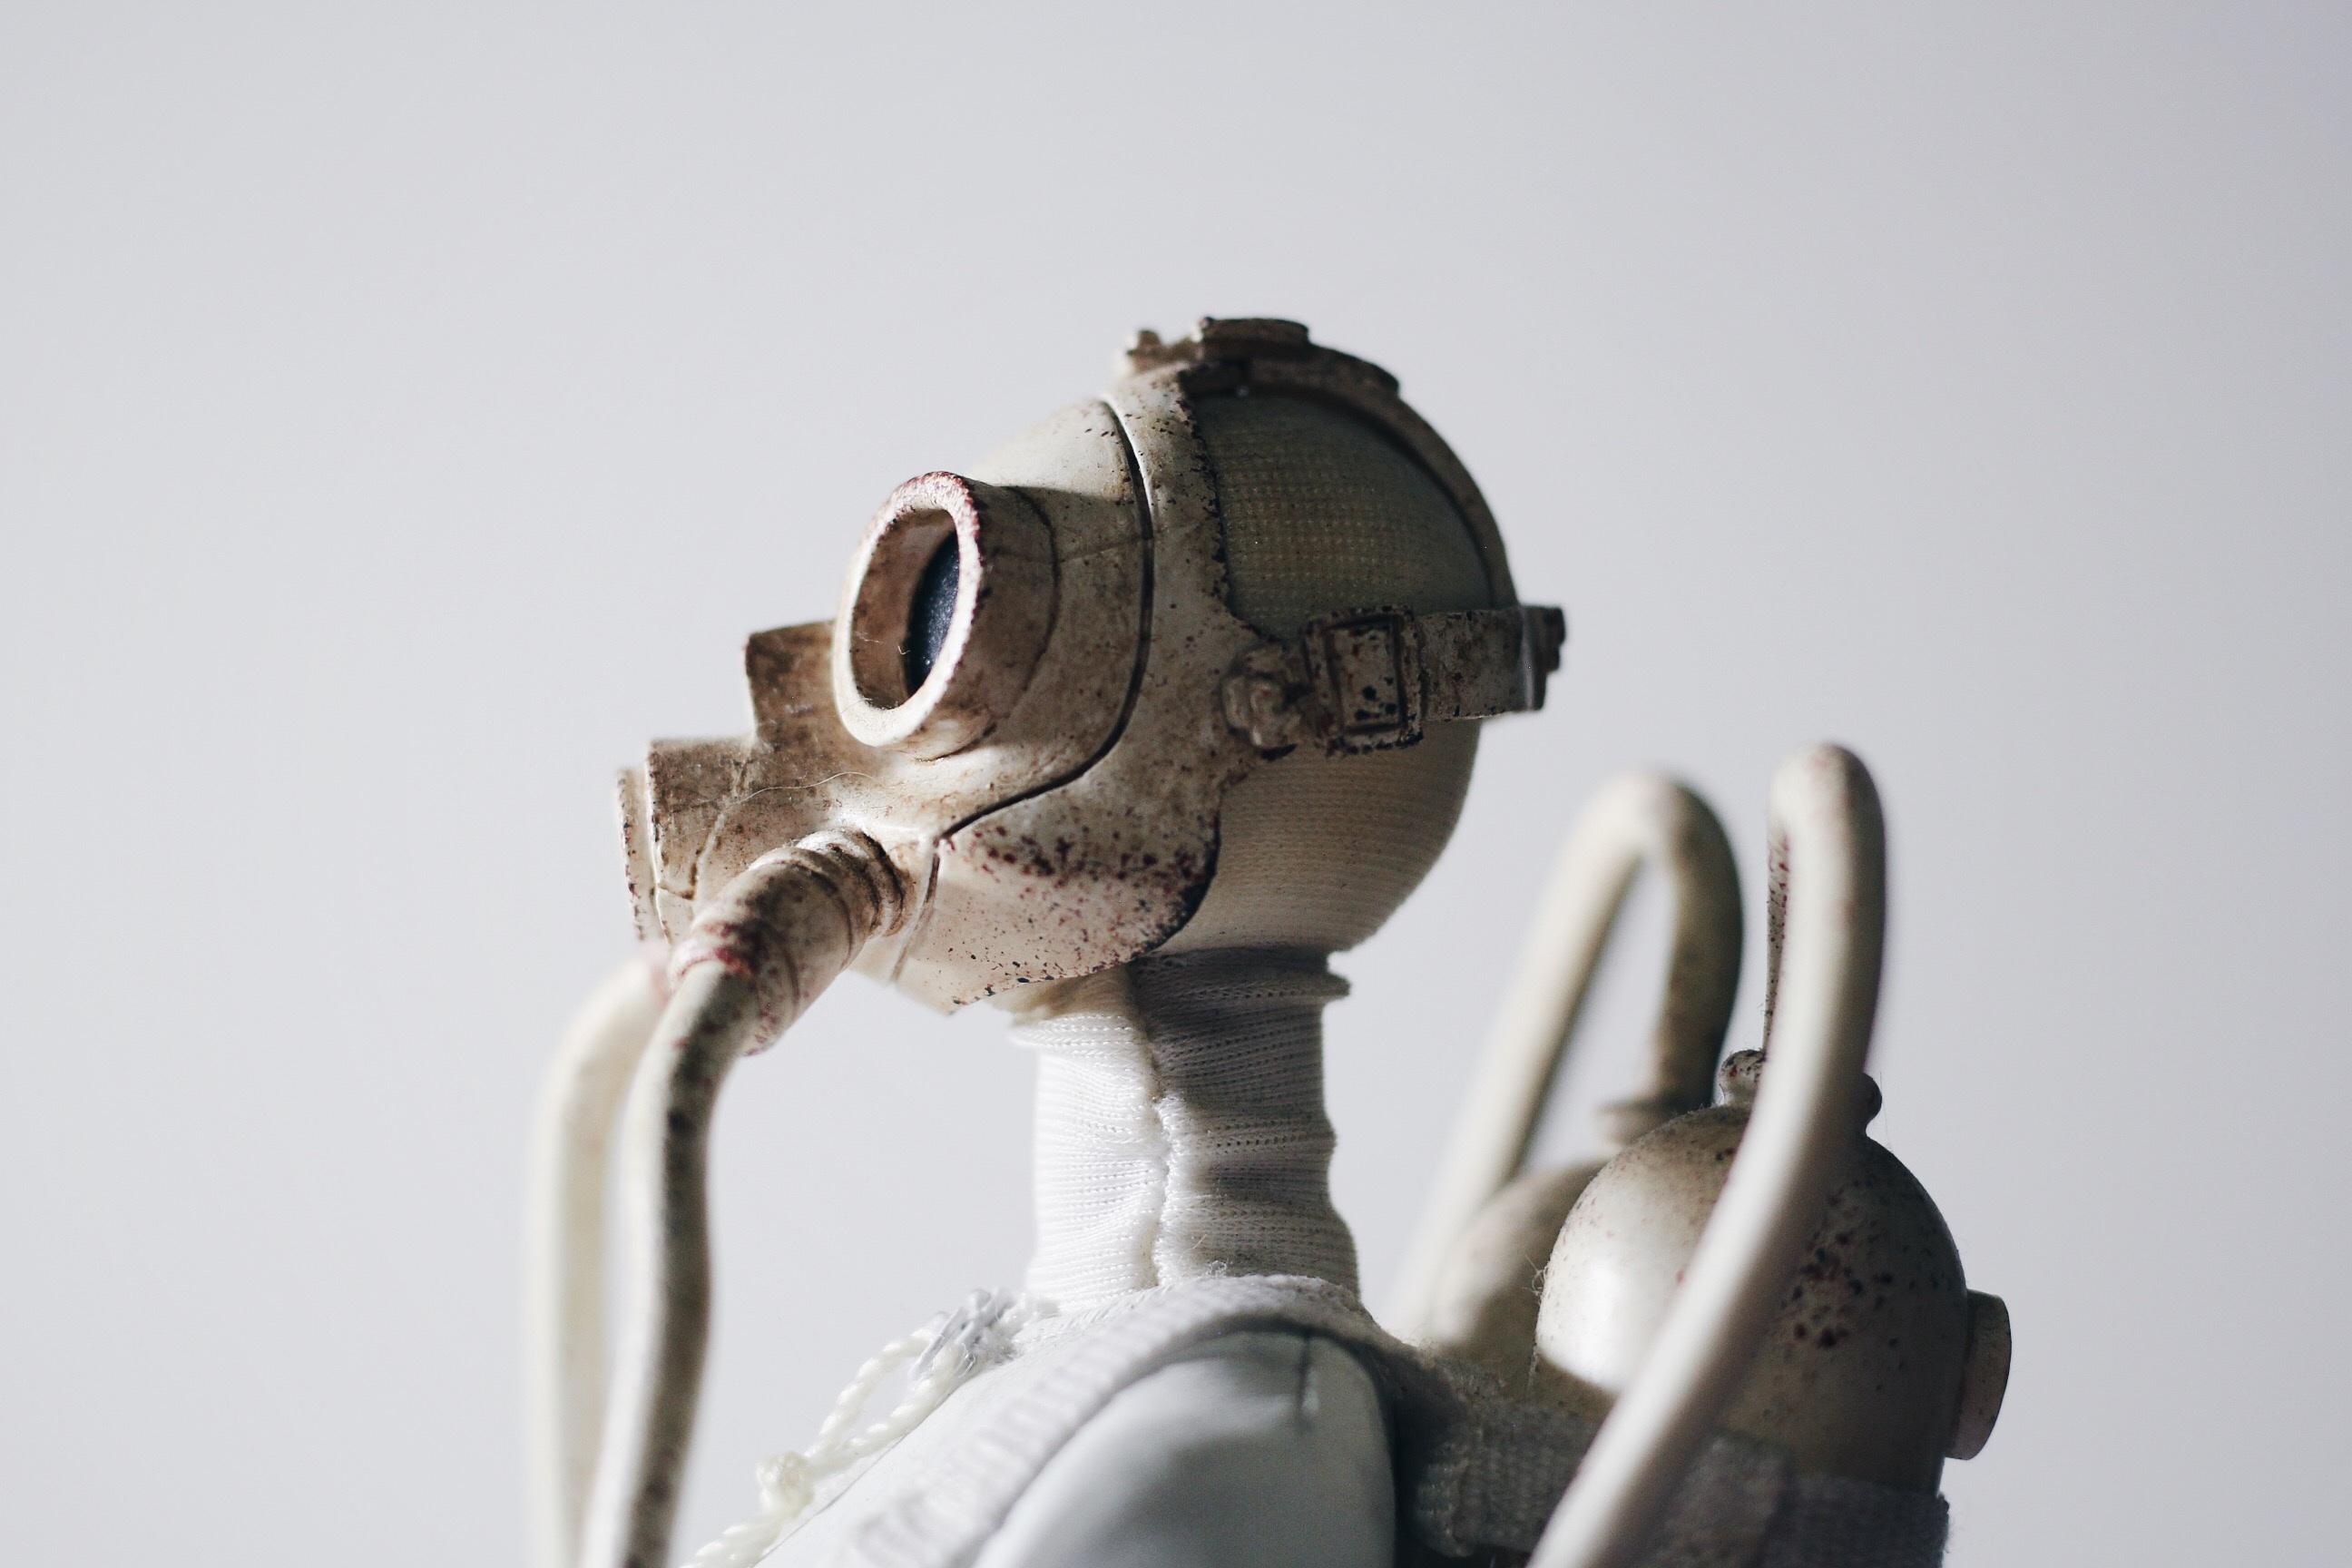 Killer Robots: Professor Robert Sparrow